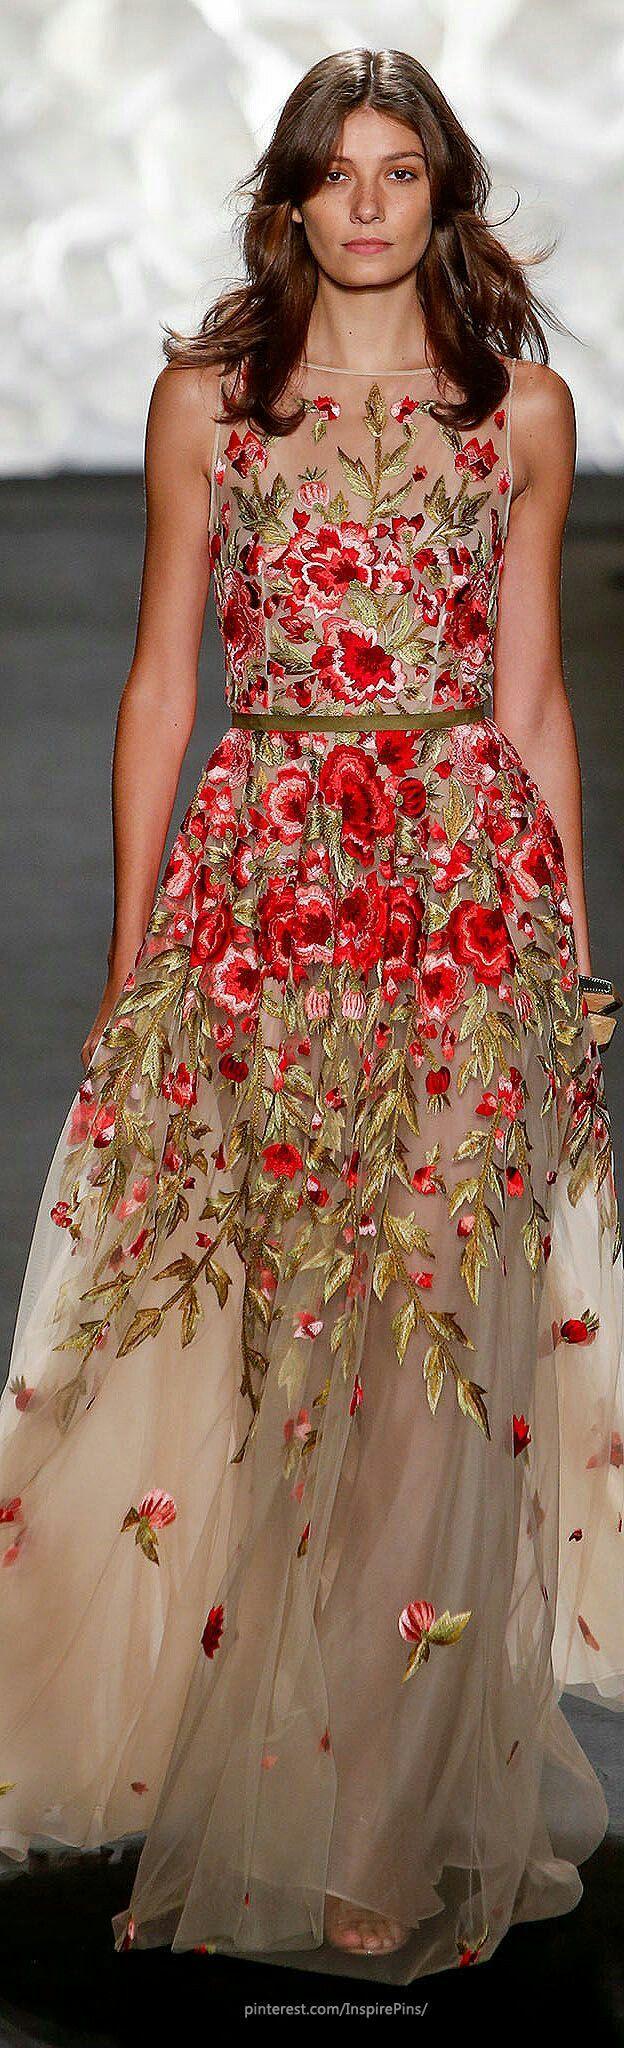 best dress inspo images on pinterest bridal gowns short